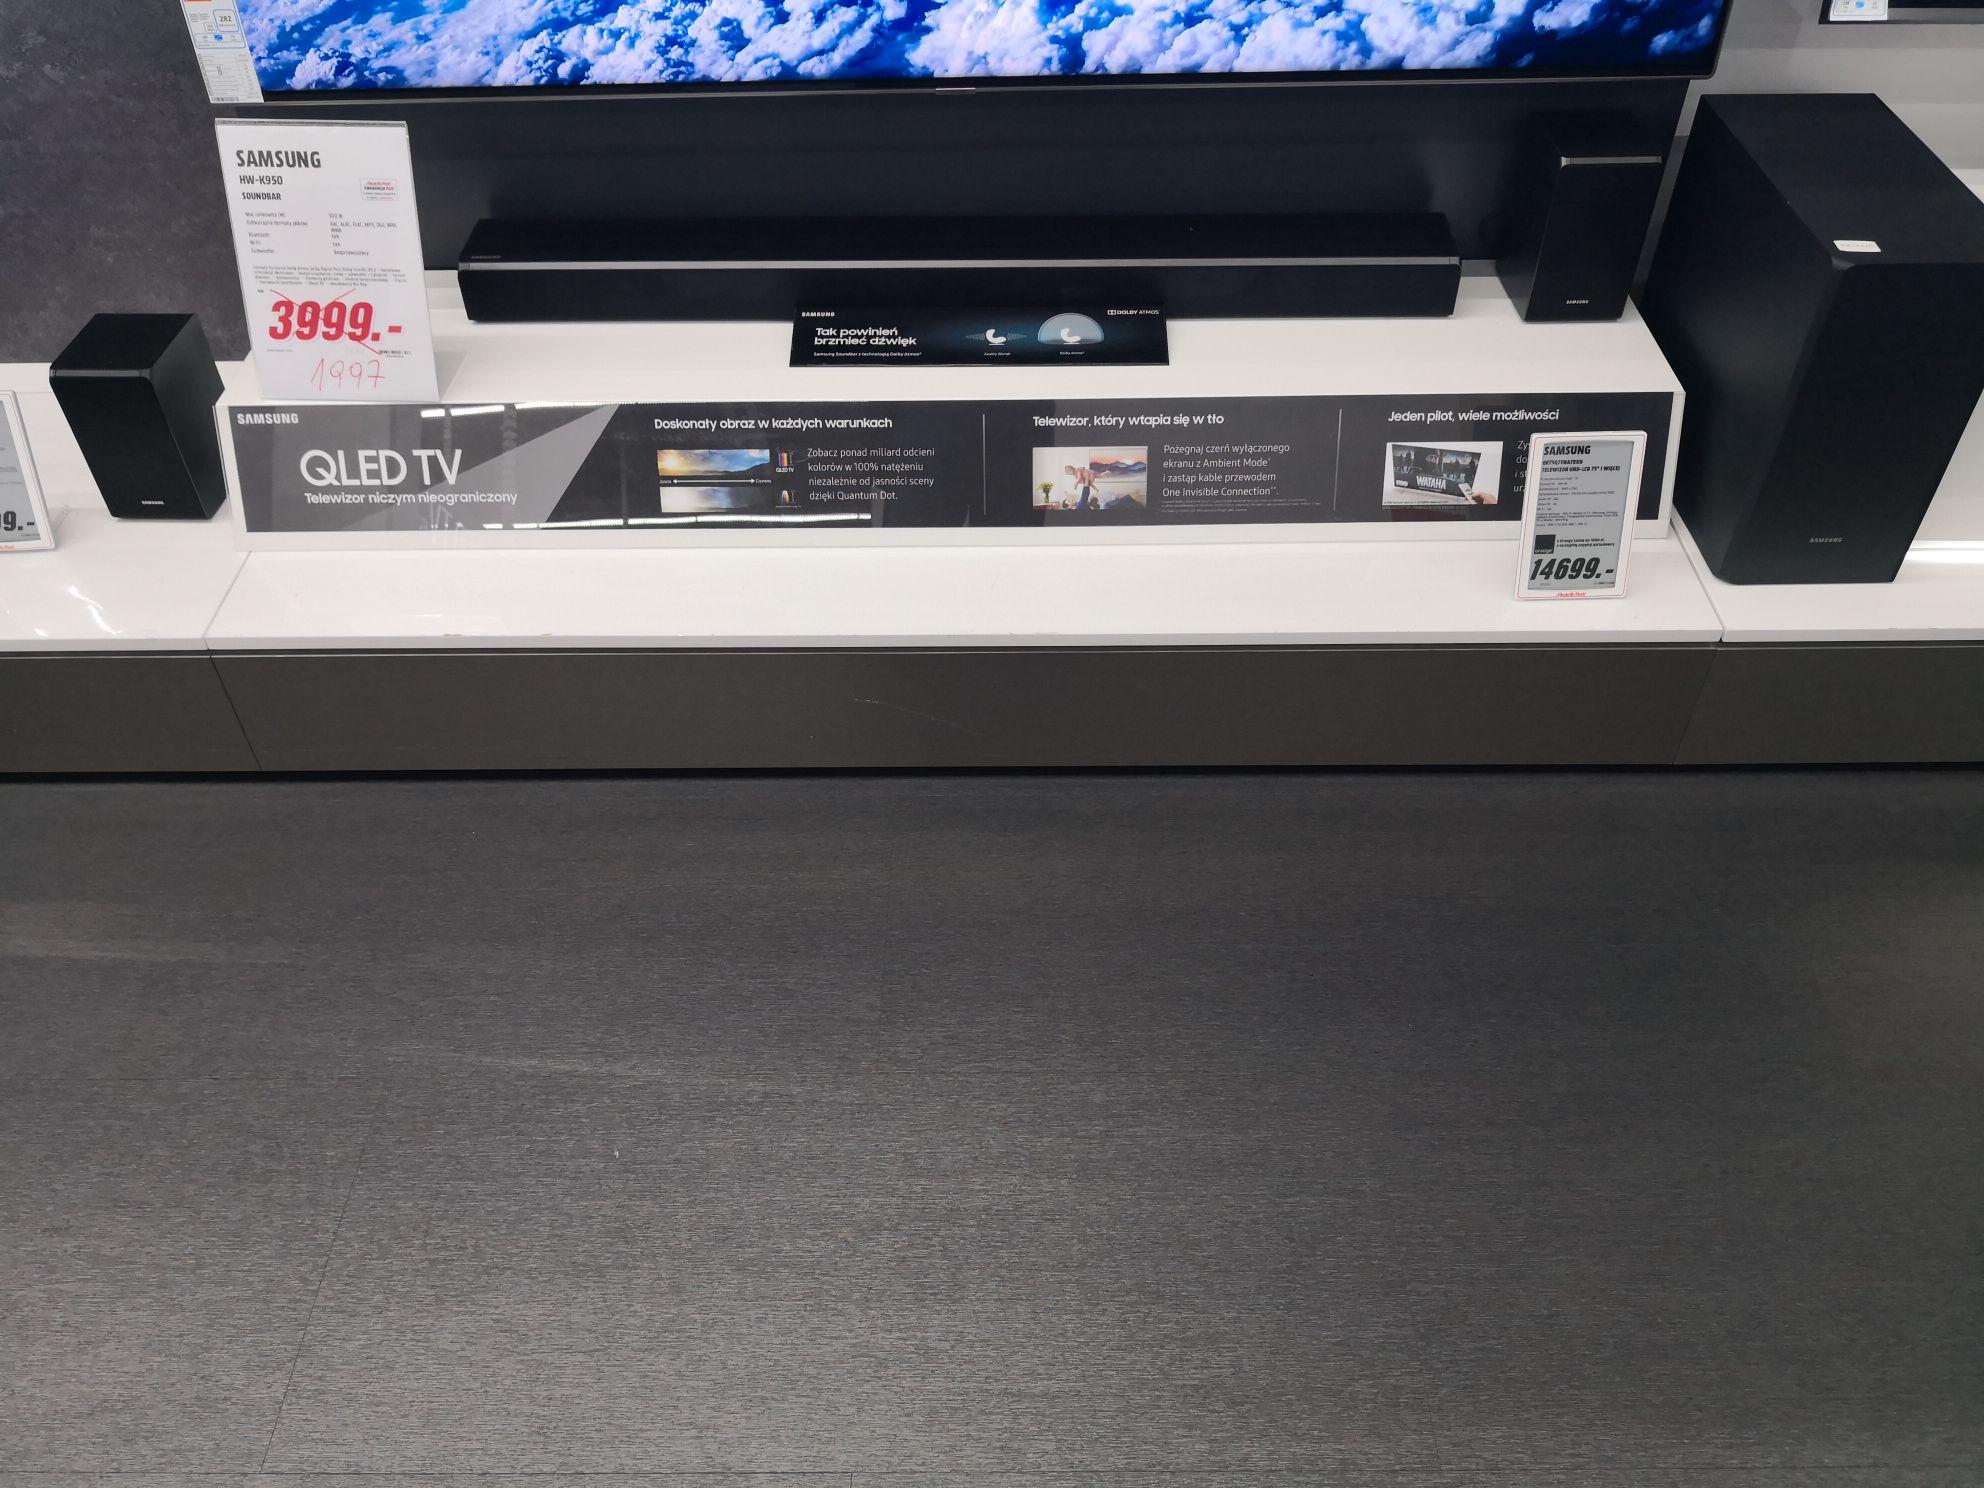 Soundbar 5.1 Samsung HW-K950 Dolby Atmos.